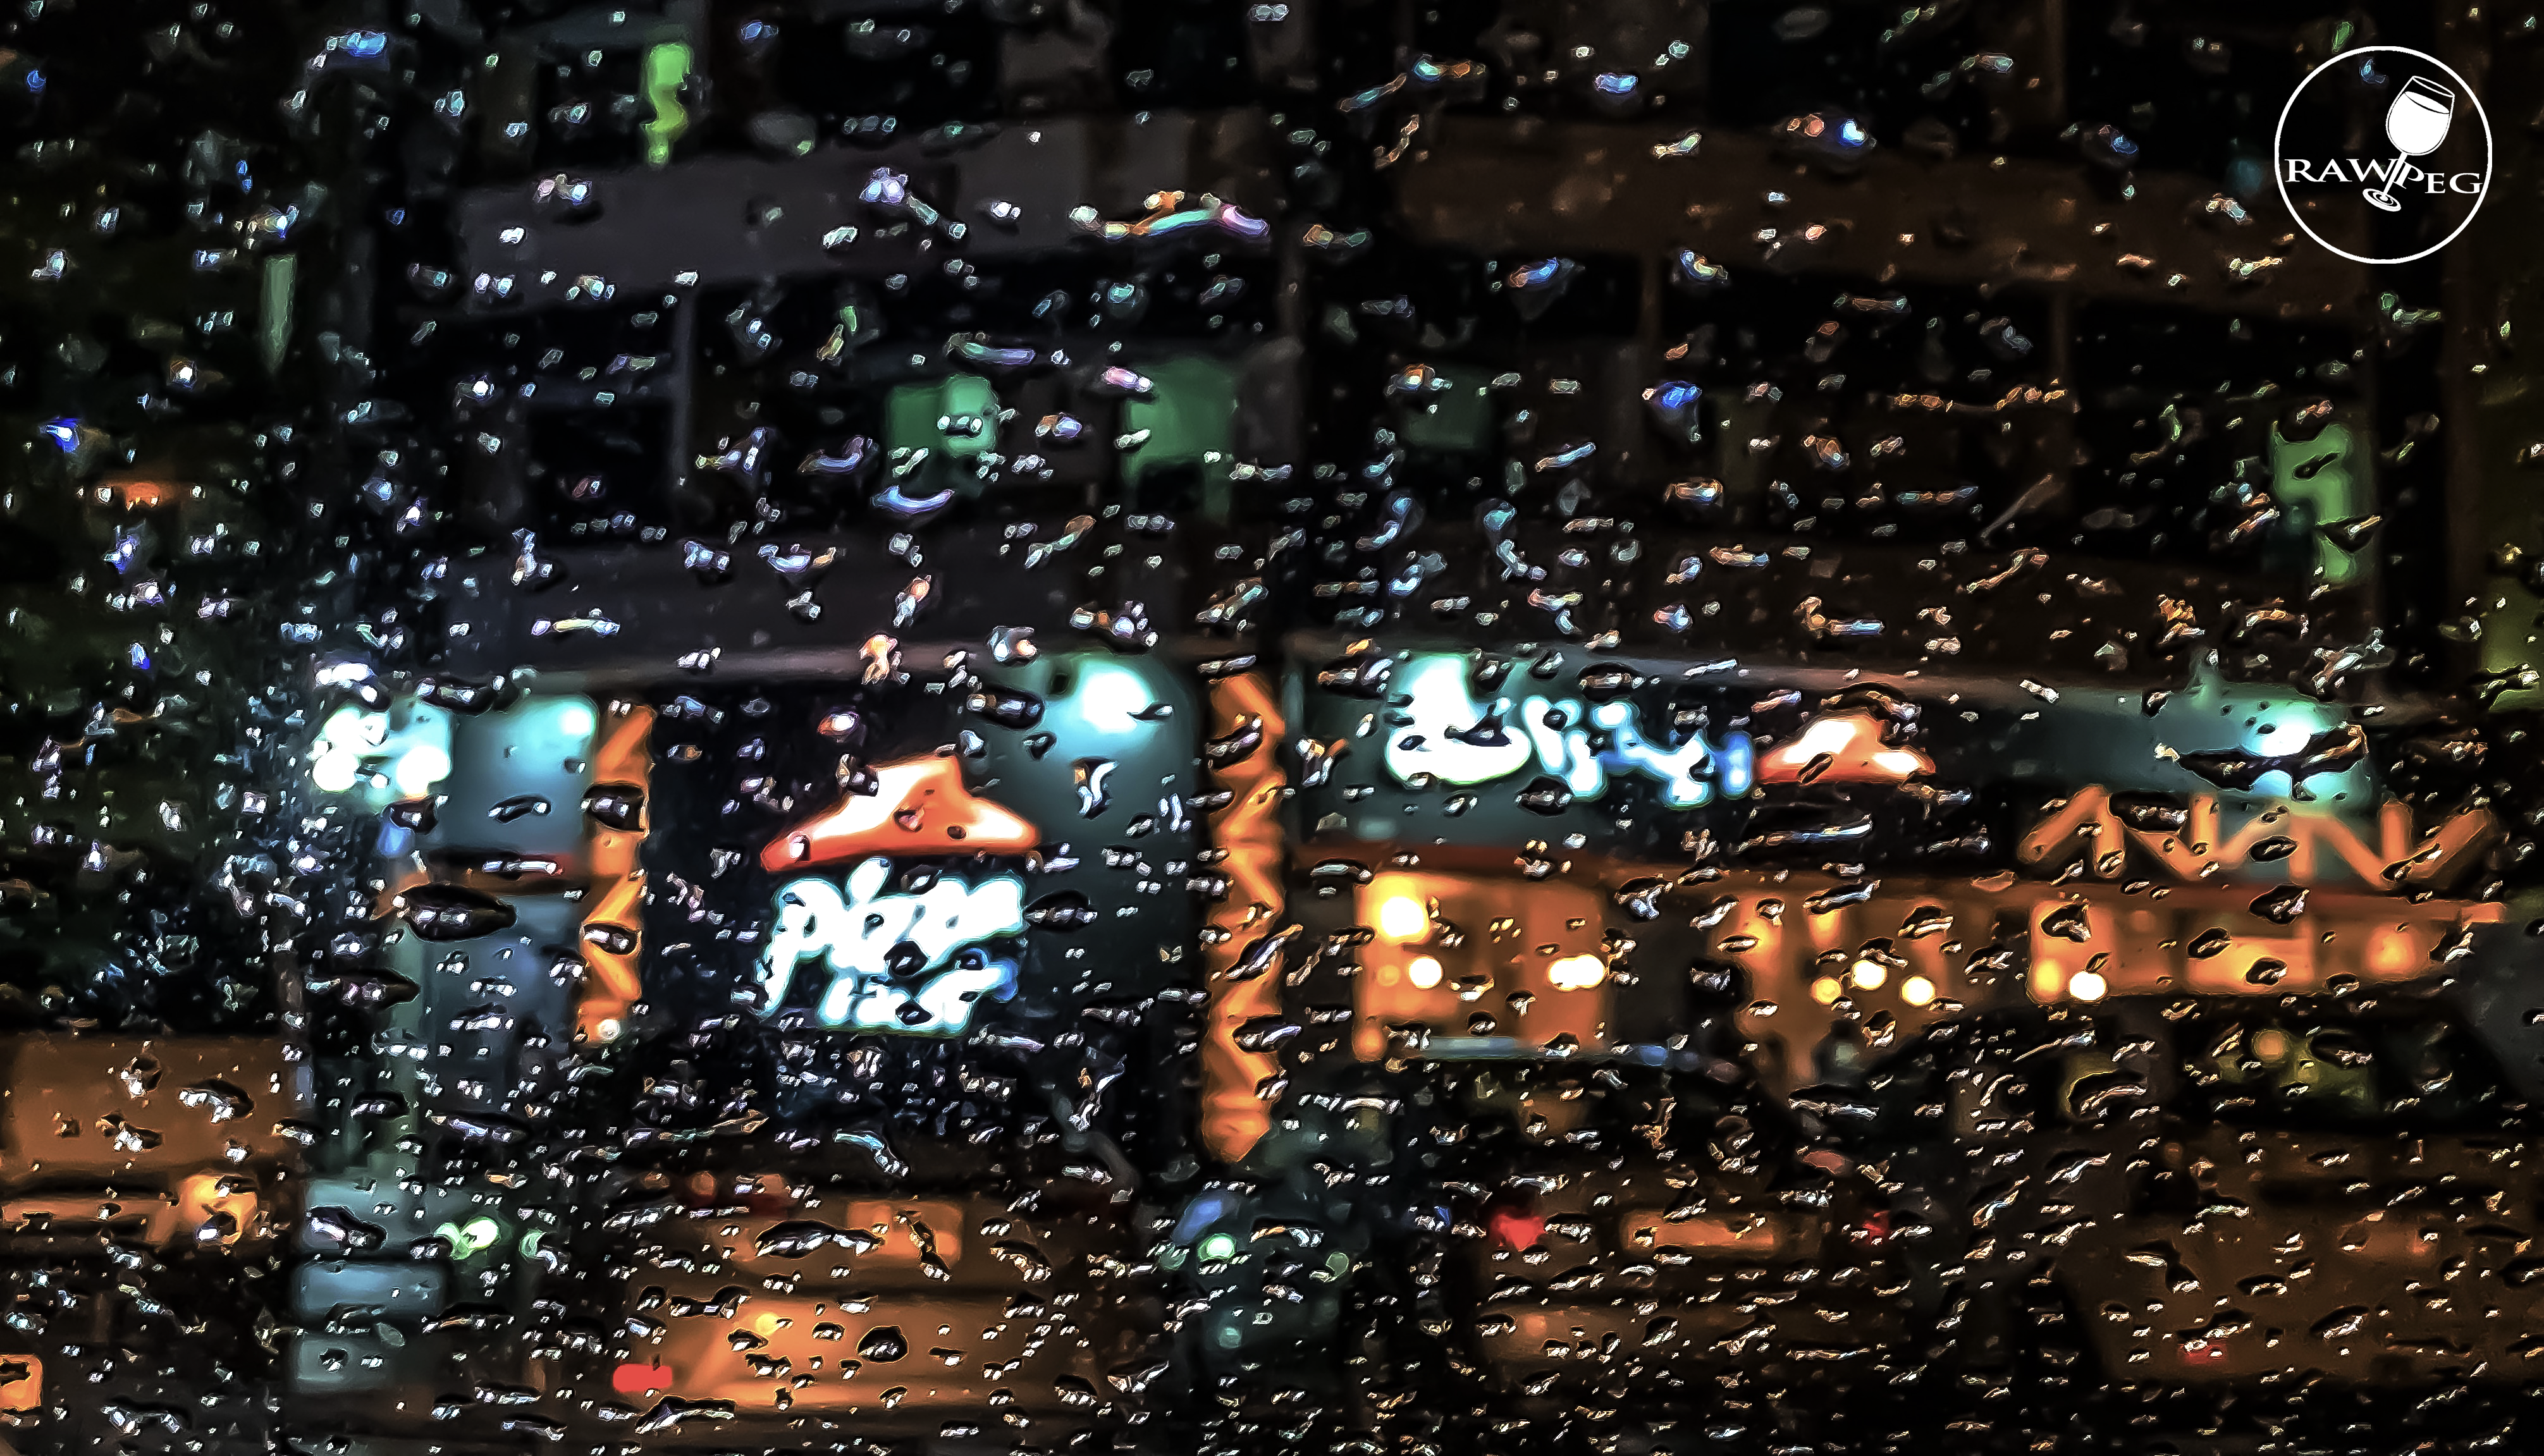 #rawpegstudio#raindrops